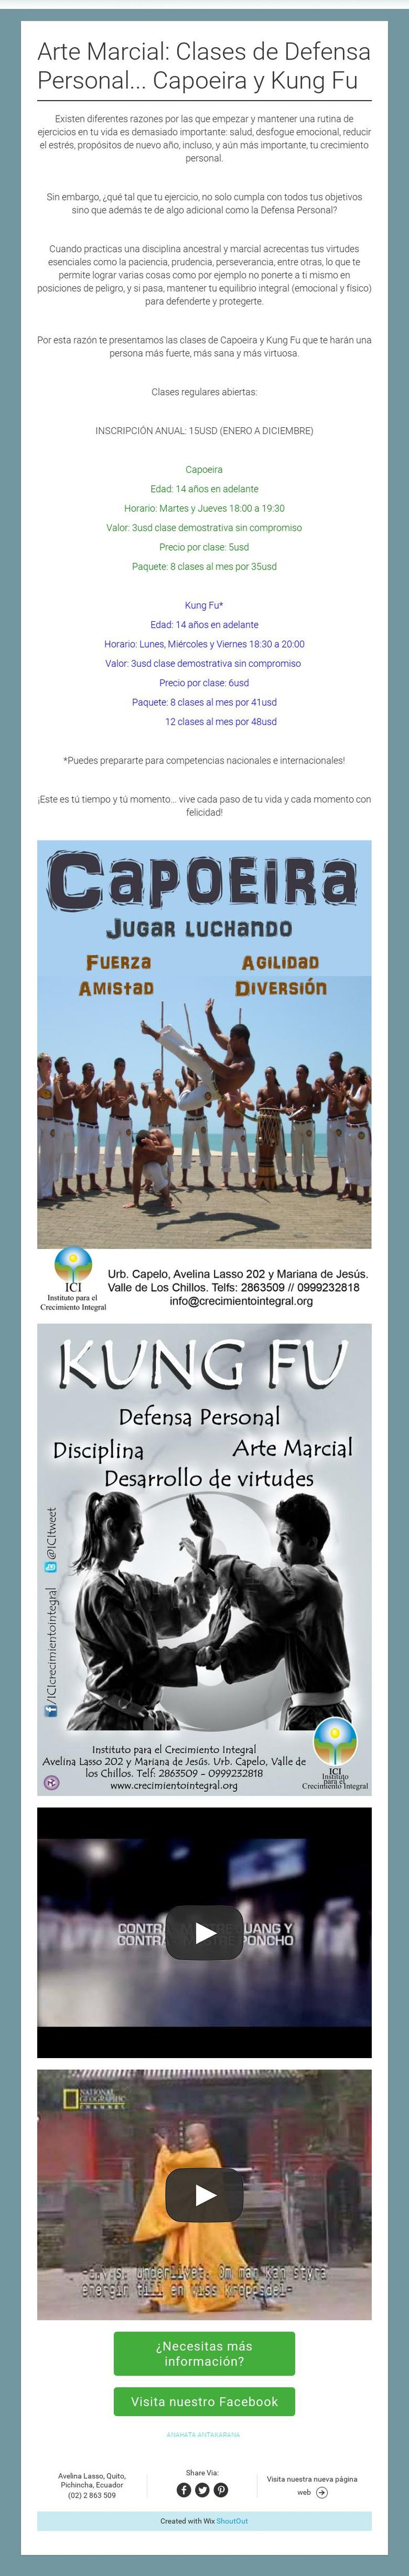 Arte Marcial: Clases de Defensa Personal... Capoeira yKung Fu